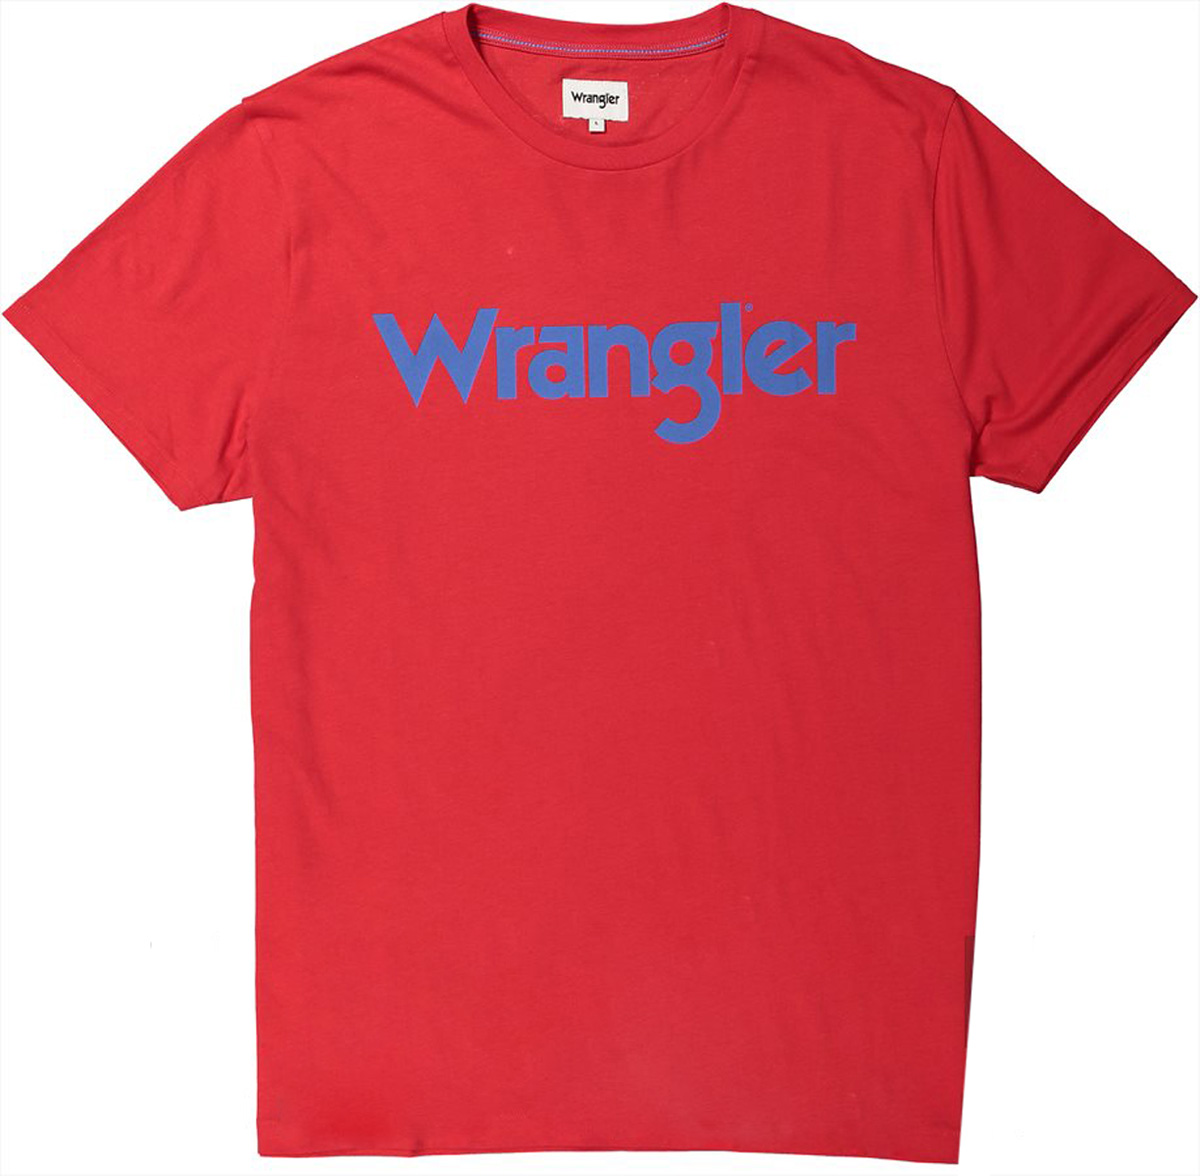 Футболка мужская Wrangler, цвет: красный. W7A86D374. Размер XL (52)W7A86D374